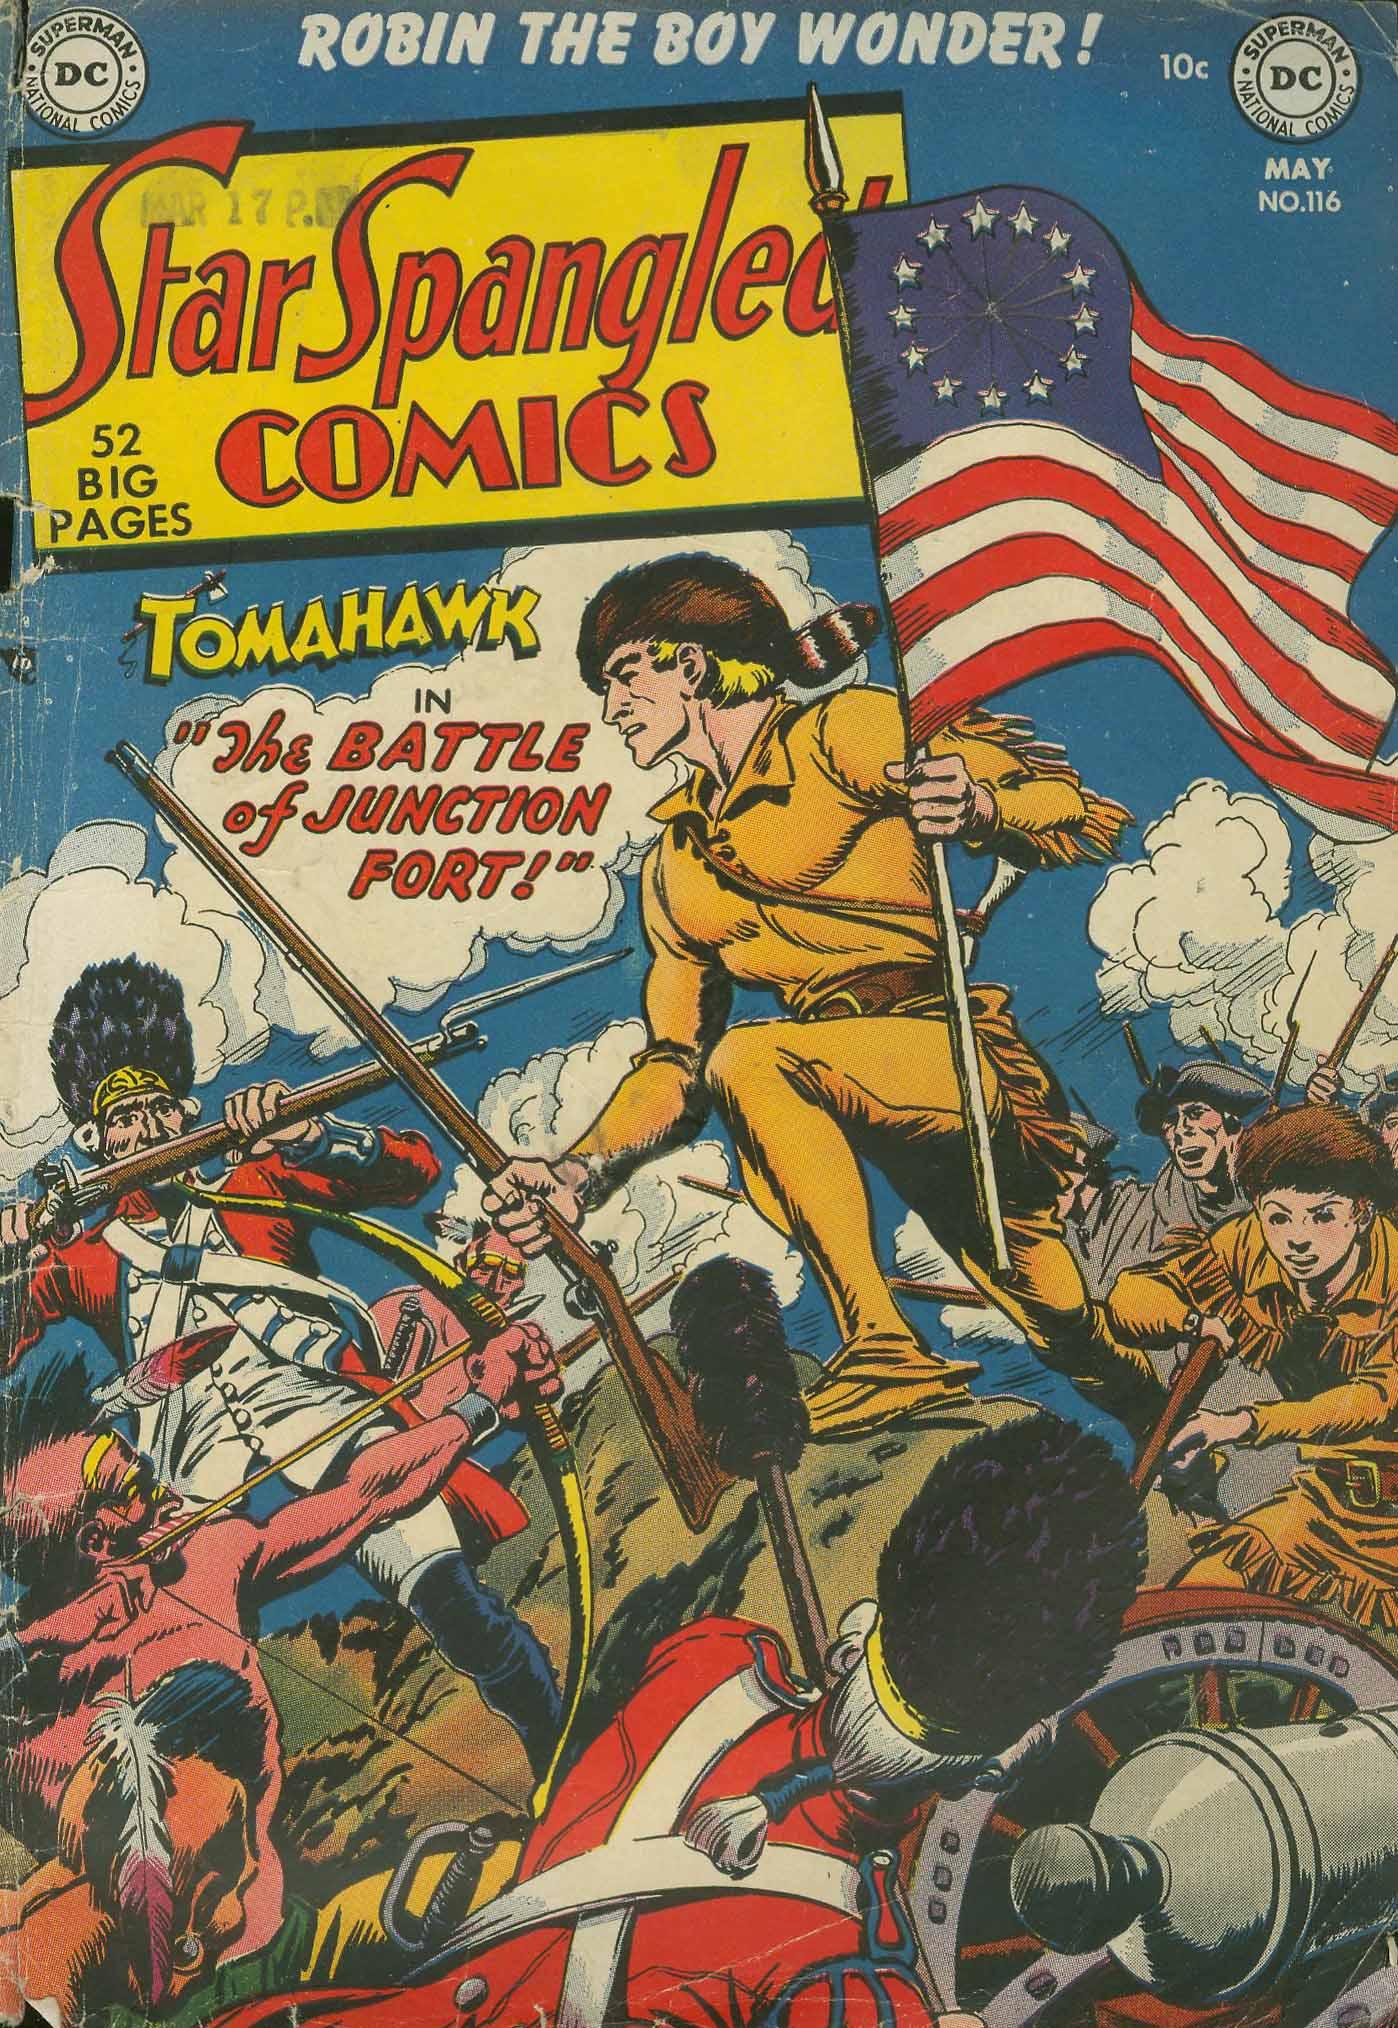 Star Spangled Comics (1941) 116 Page 1